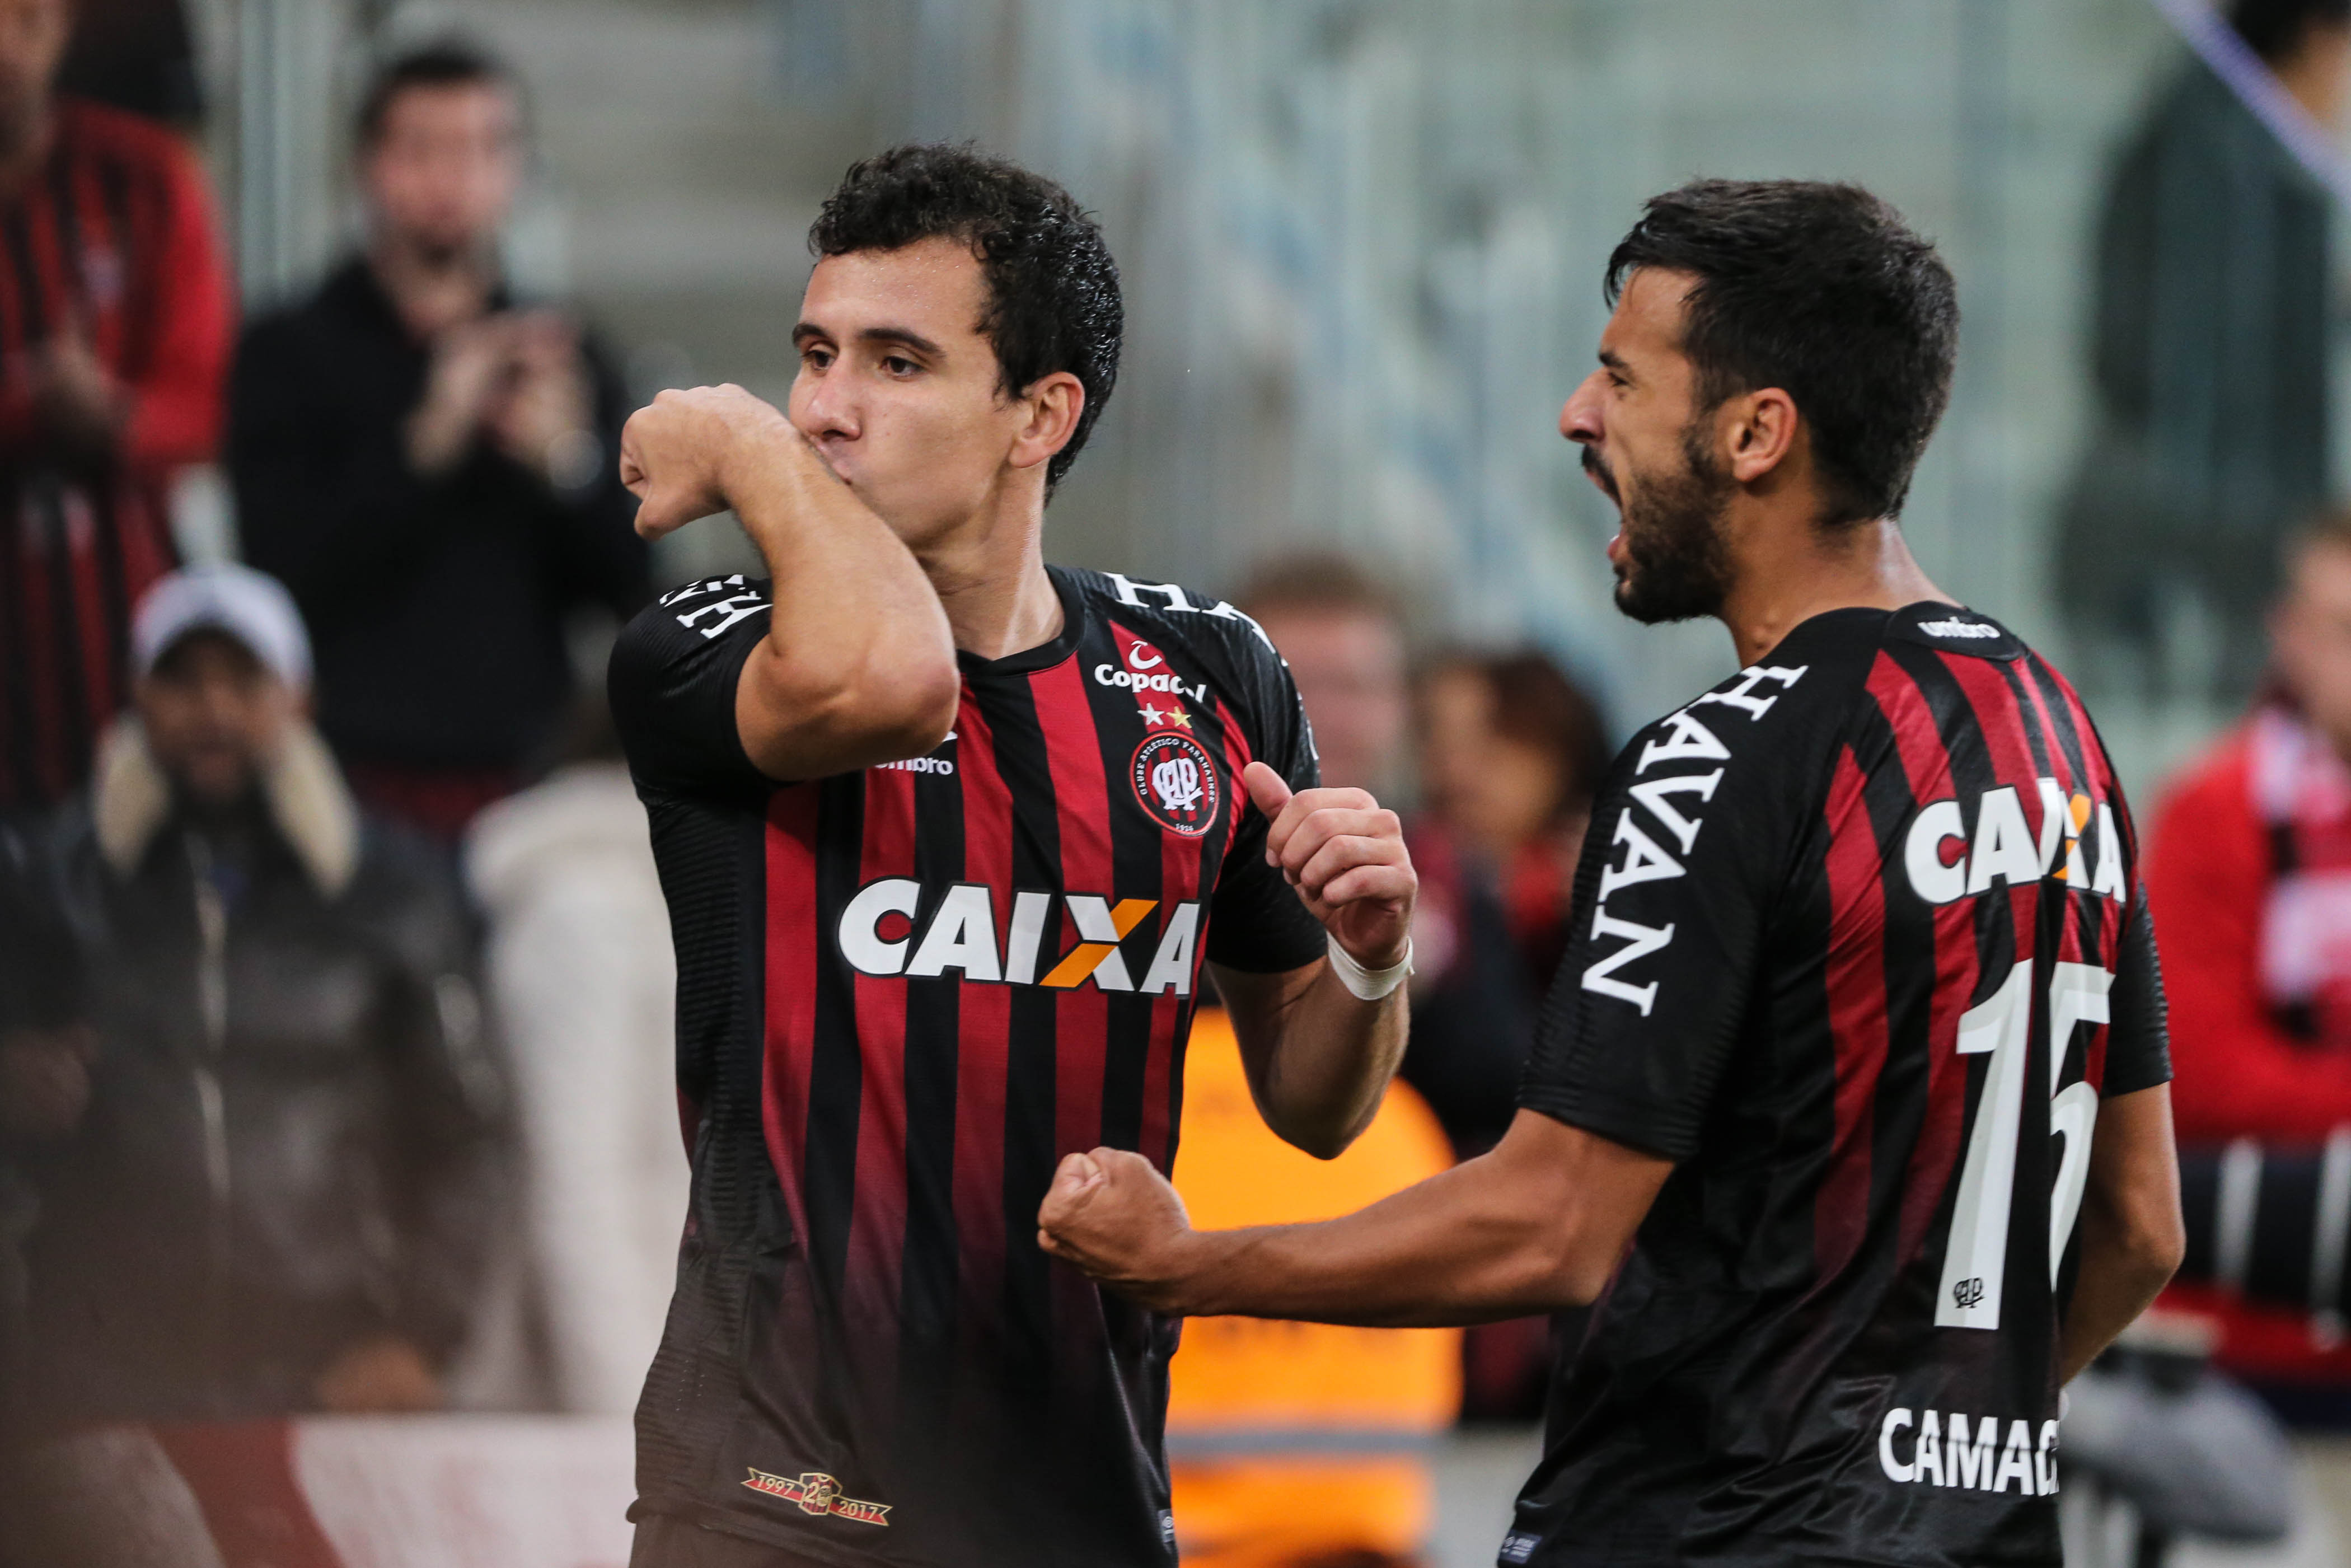 Confira os lances de Chapecoense 0 x 0 Atlético-PR.